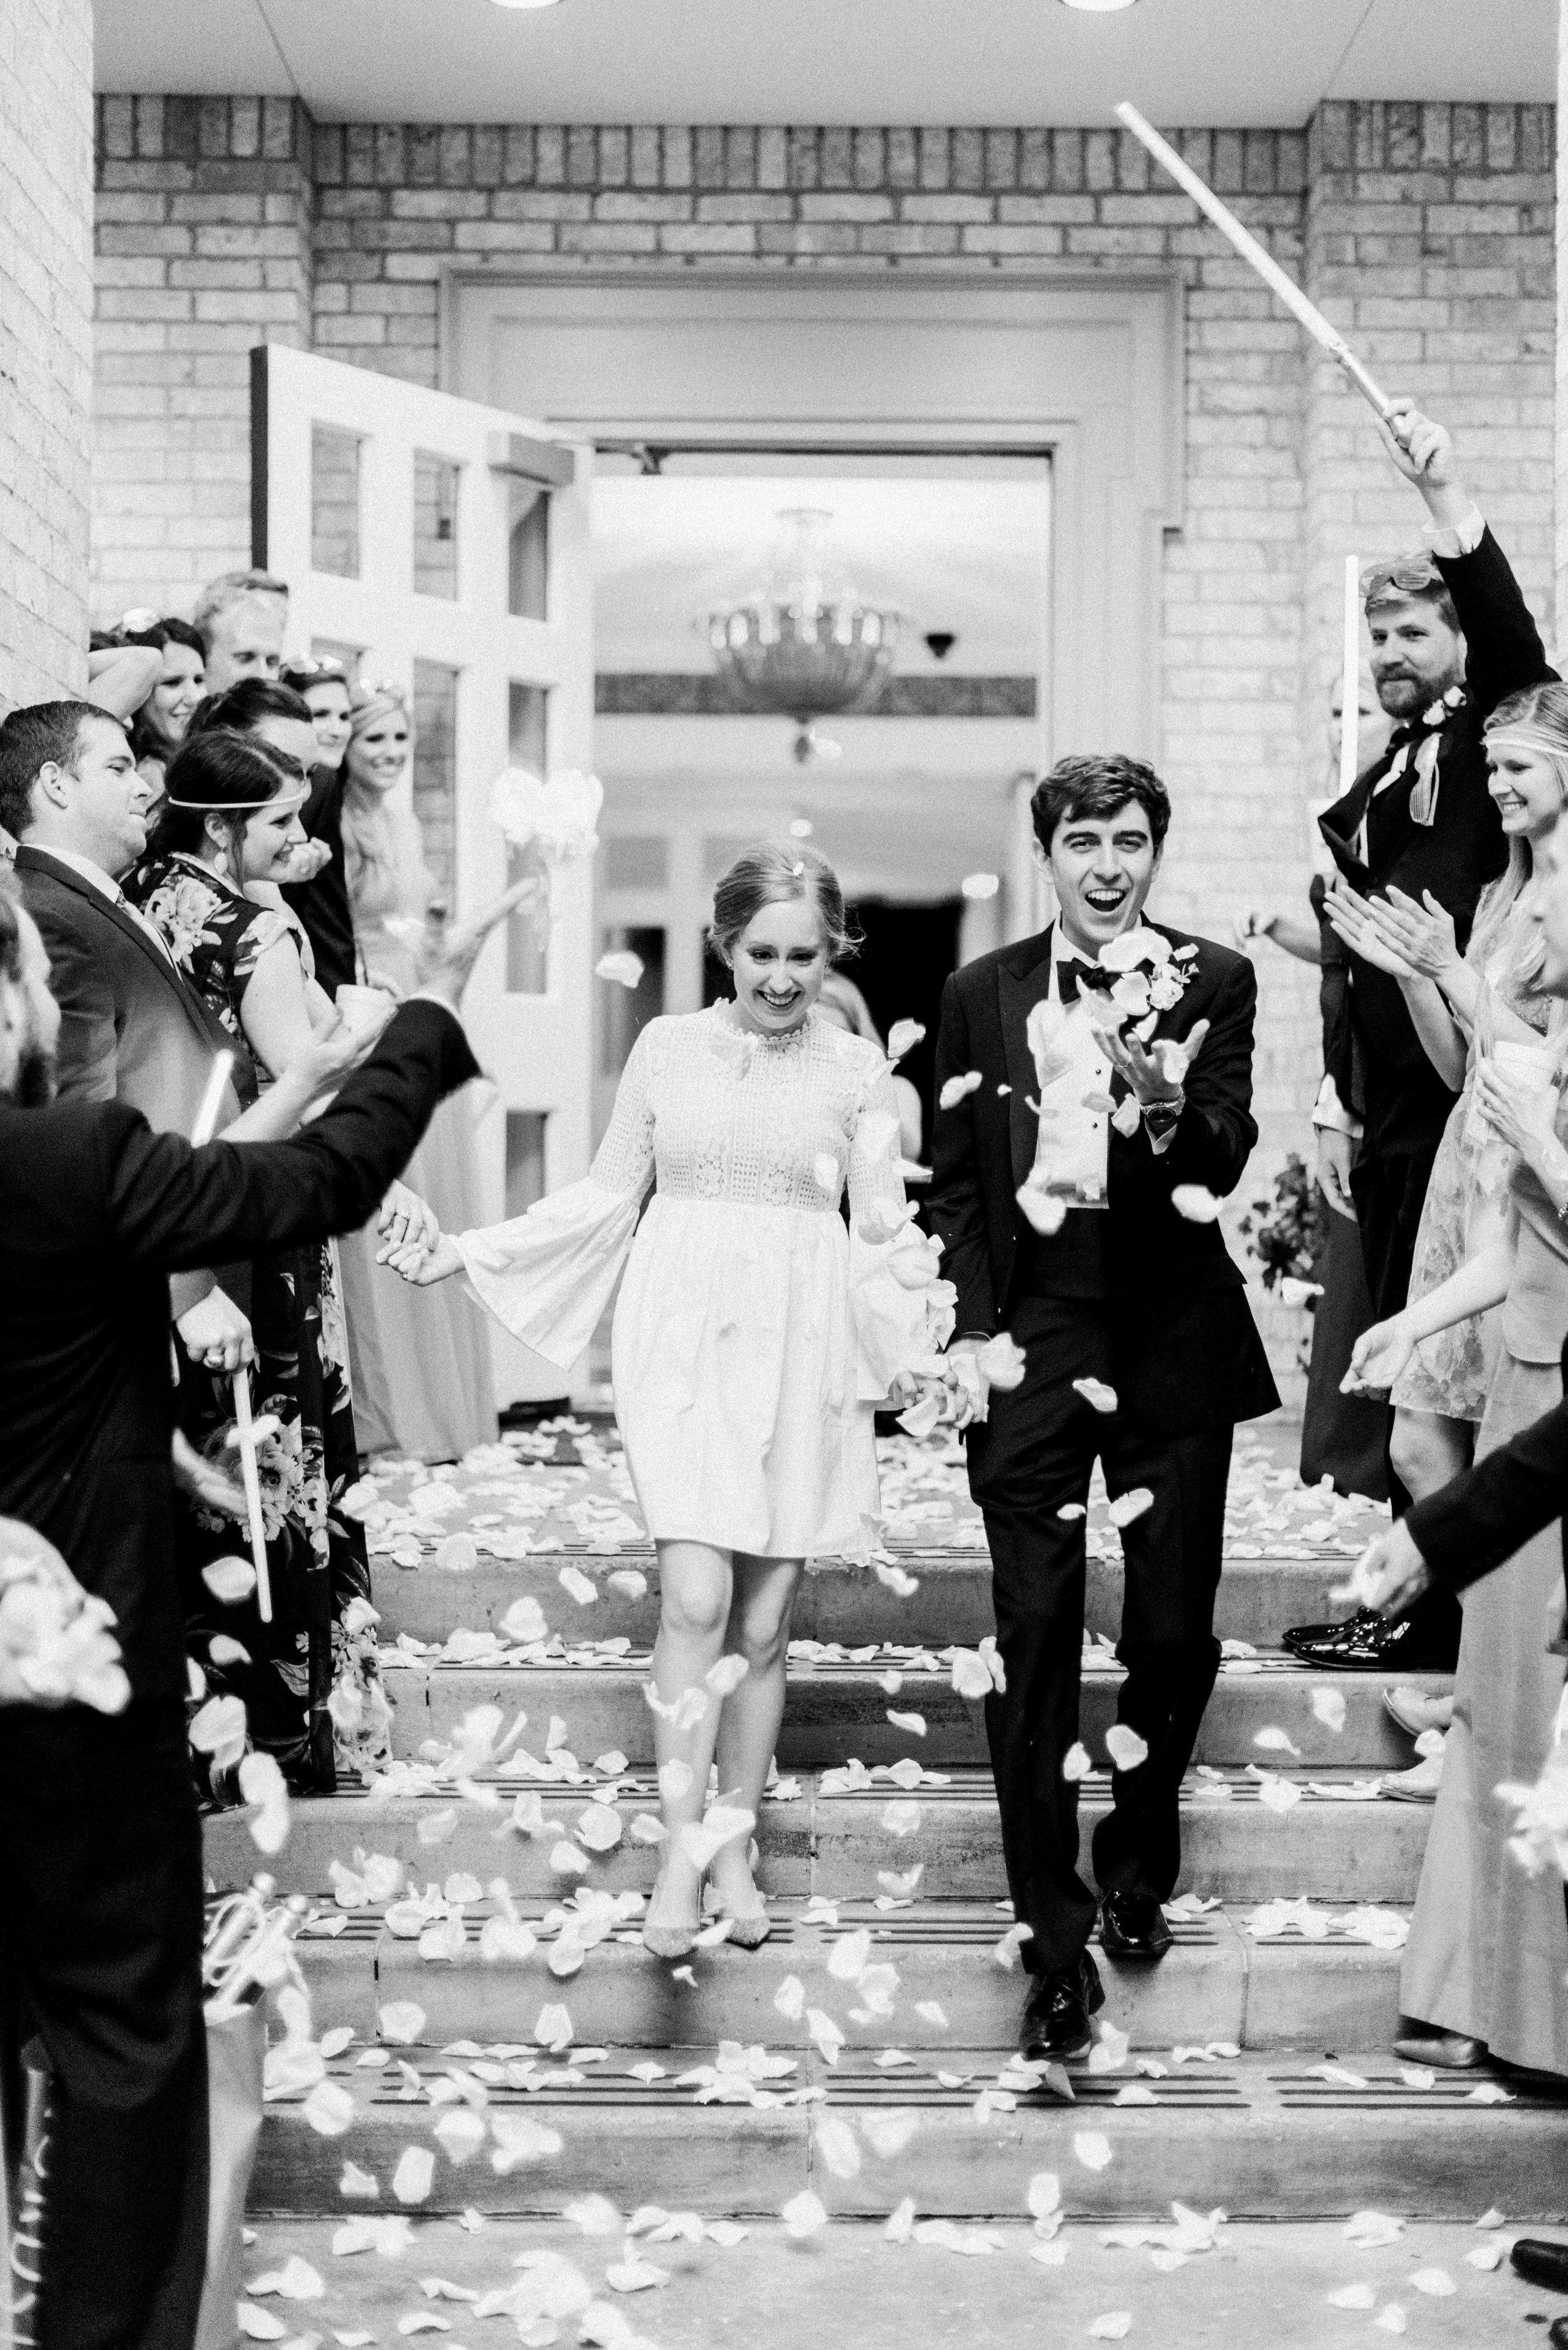 Fine-Art-Film-Houston-Wedding-Photographer-Best-Top-Luxury-Texas-Austin-Dallas-Destination-Dana-Fernandez-Photography-River-Oaks-Country-Club-South-Main-Baptist-Ceremony-Reception-Wedding-45.jpg